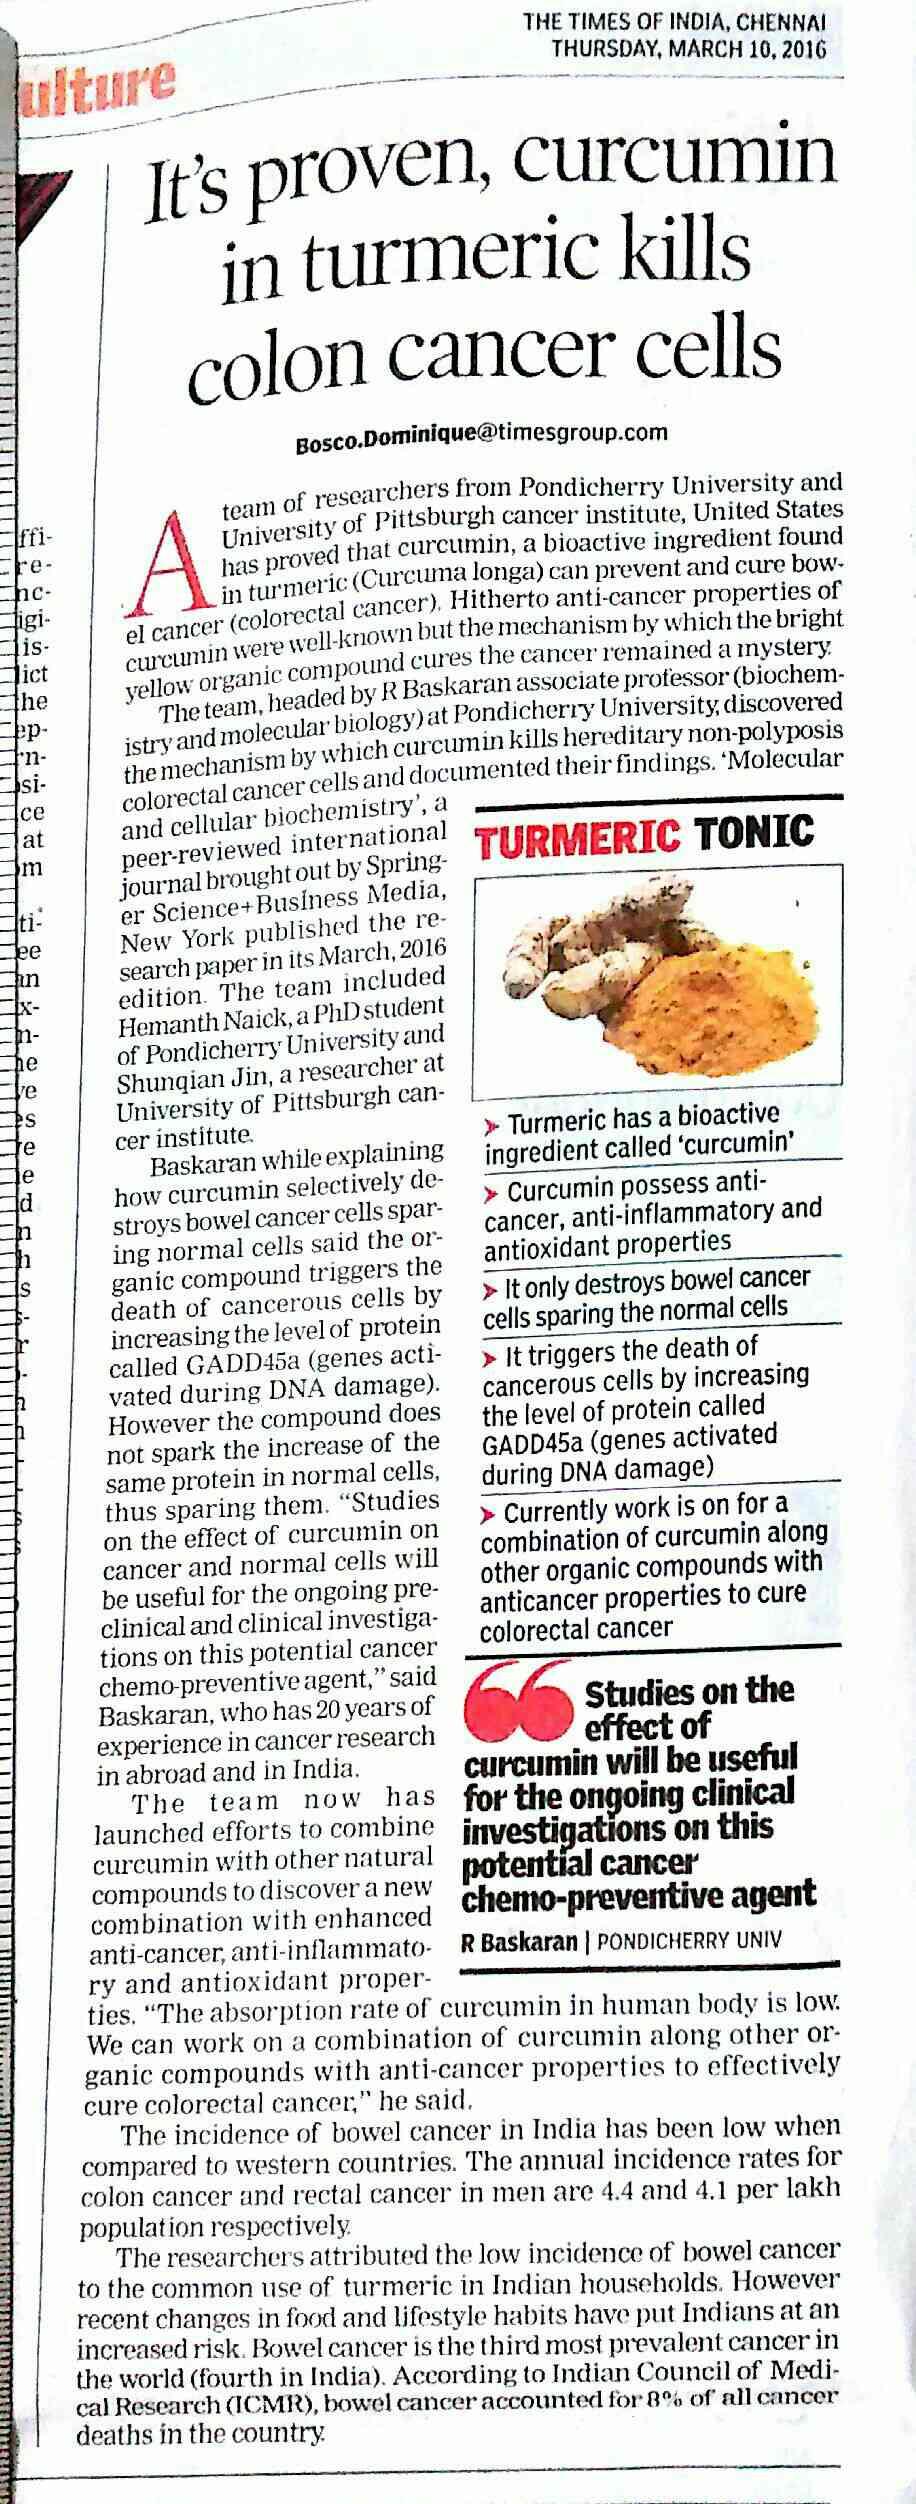 Latest report on curcumin proven for colon cancer .